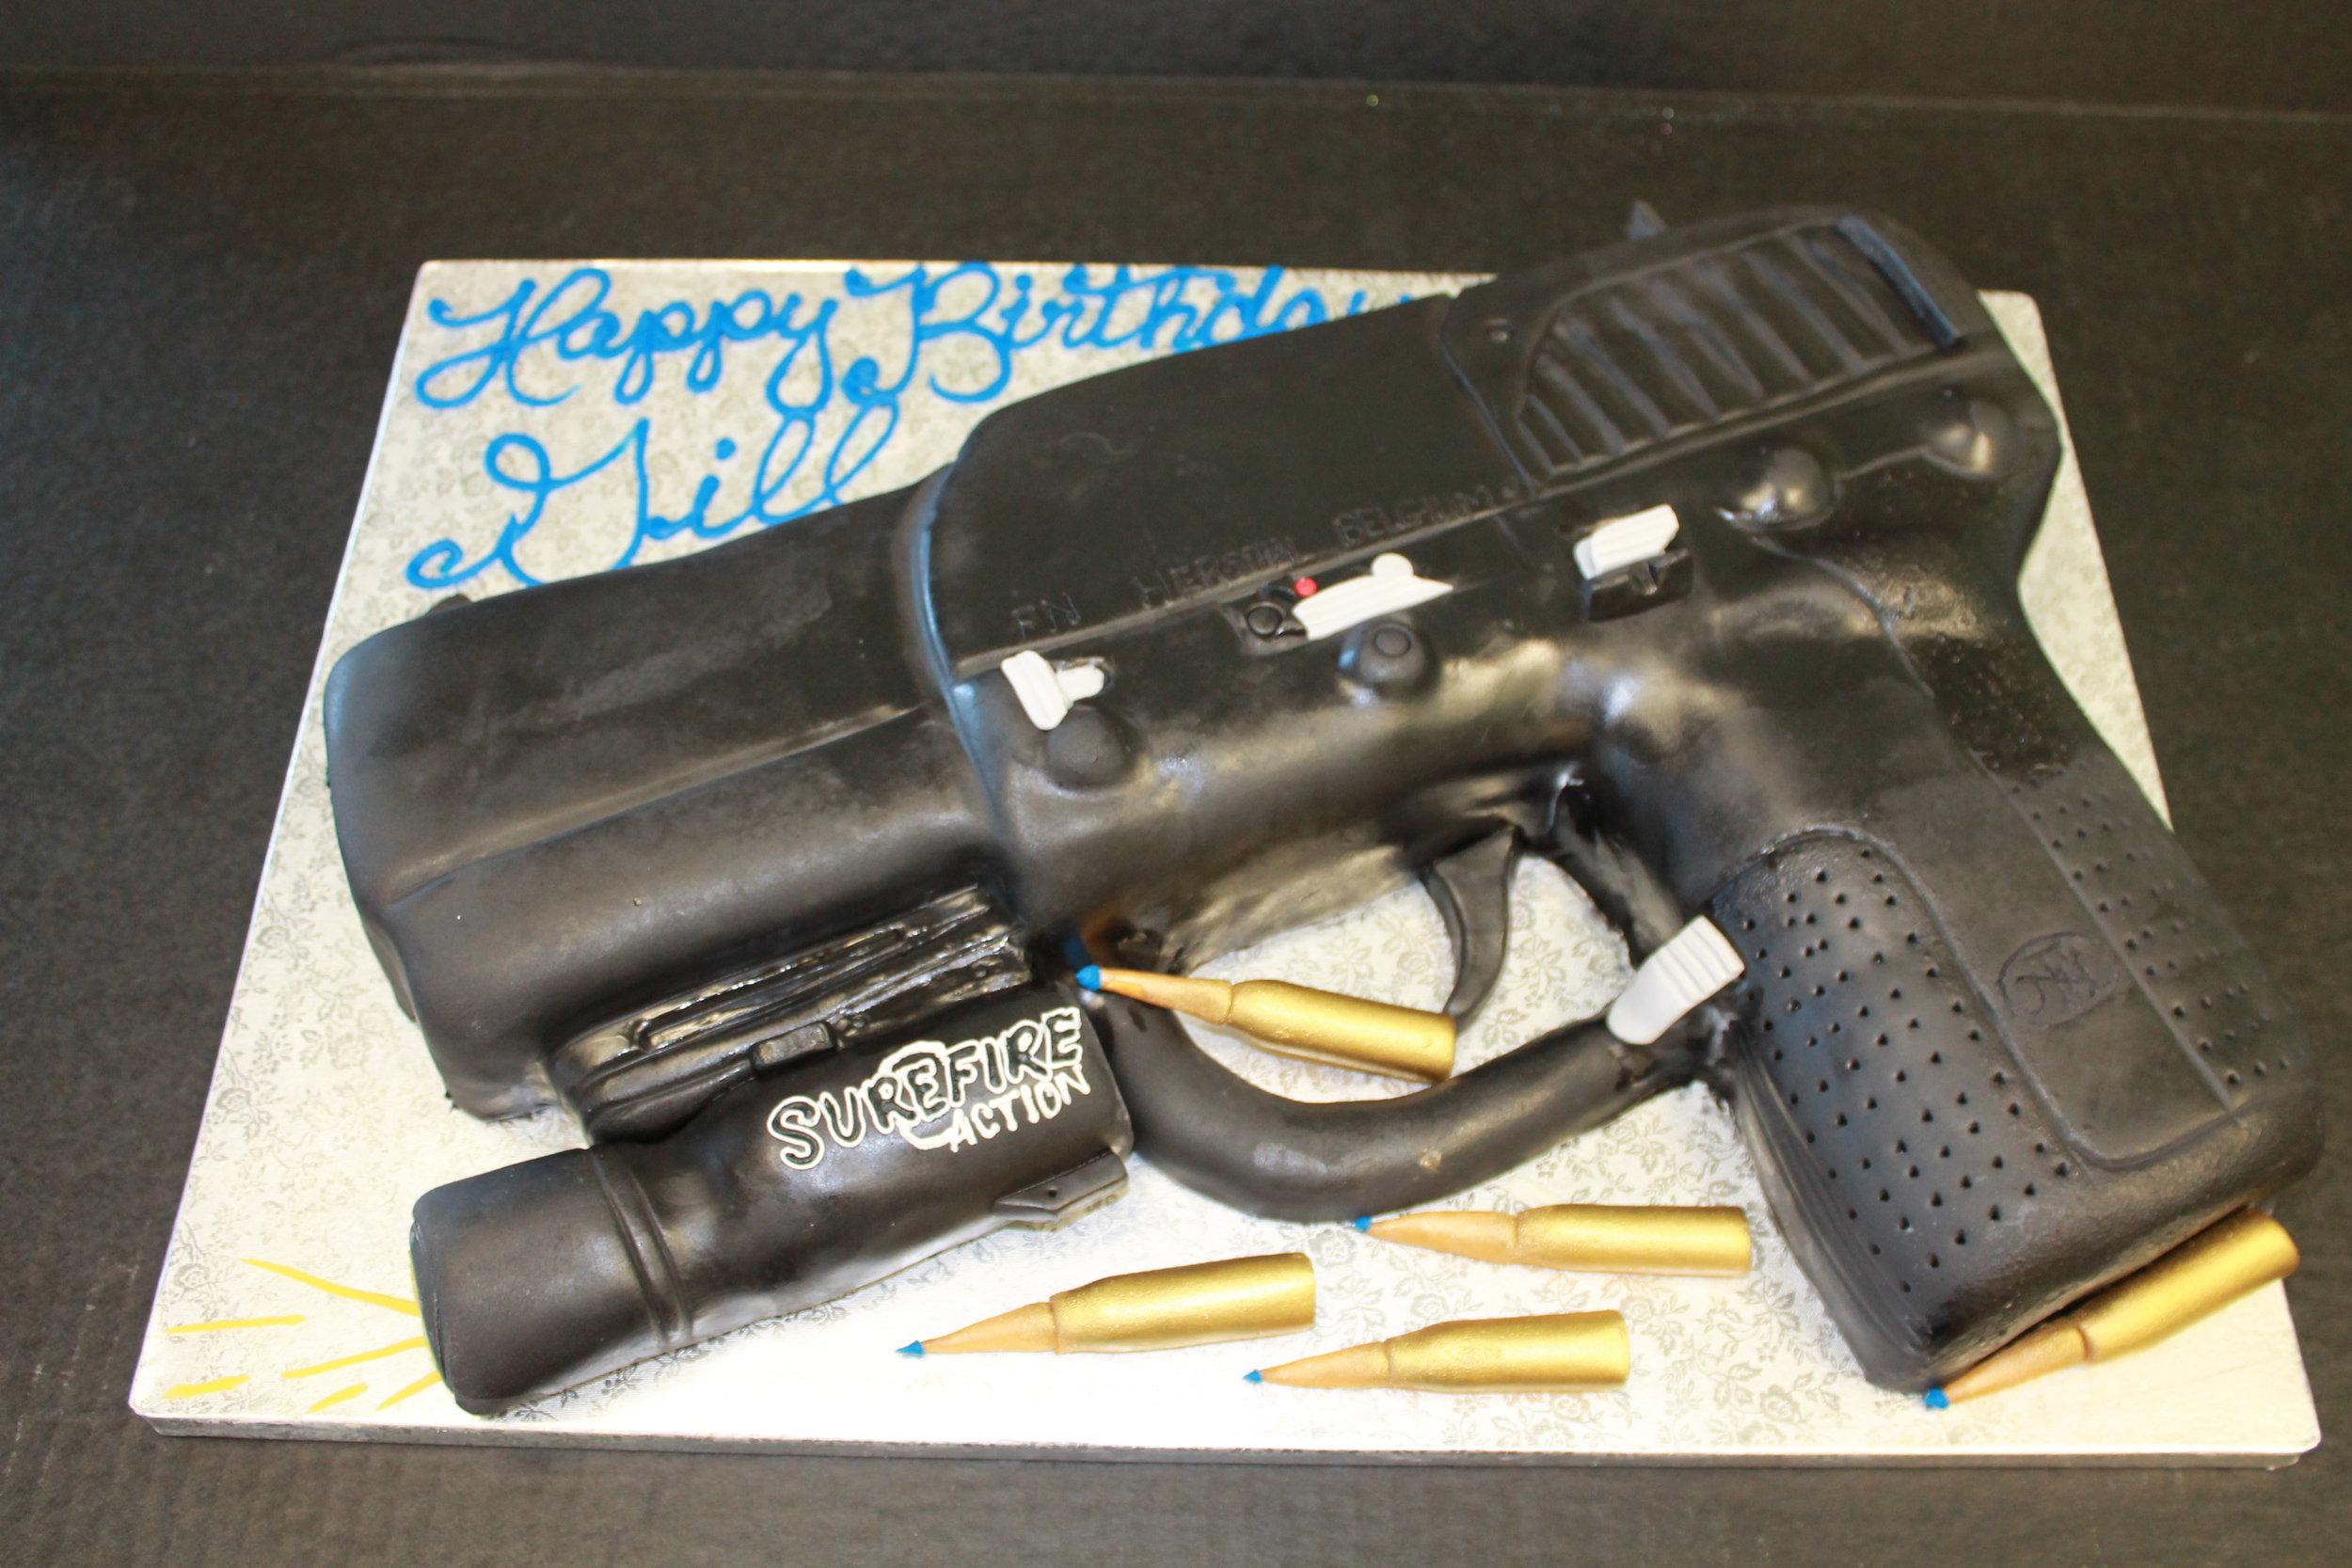 Police Officer Birthday